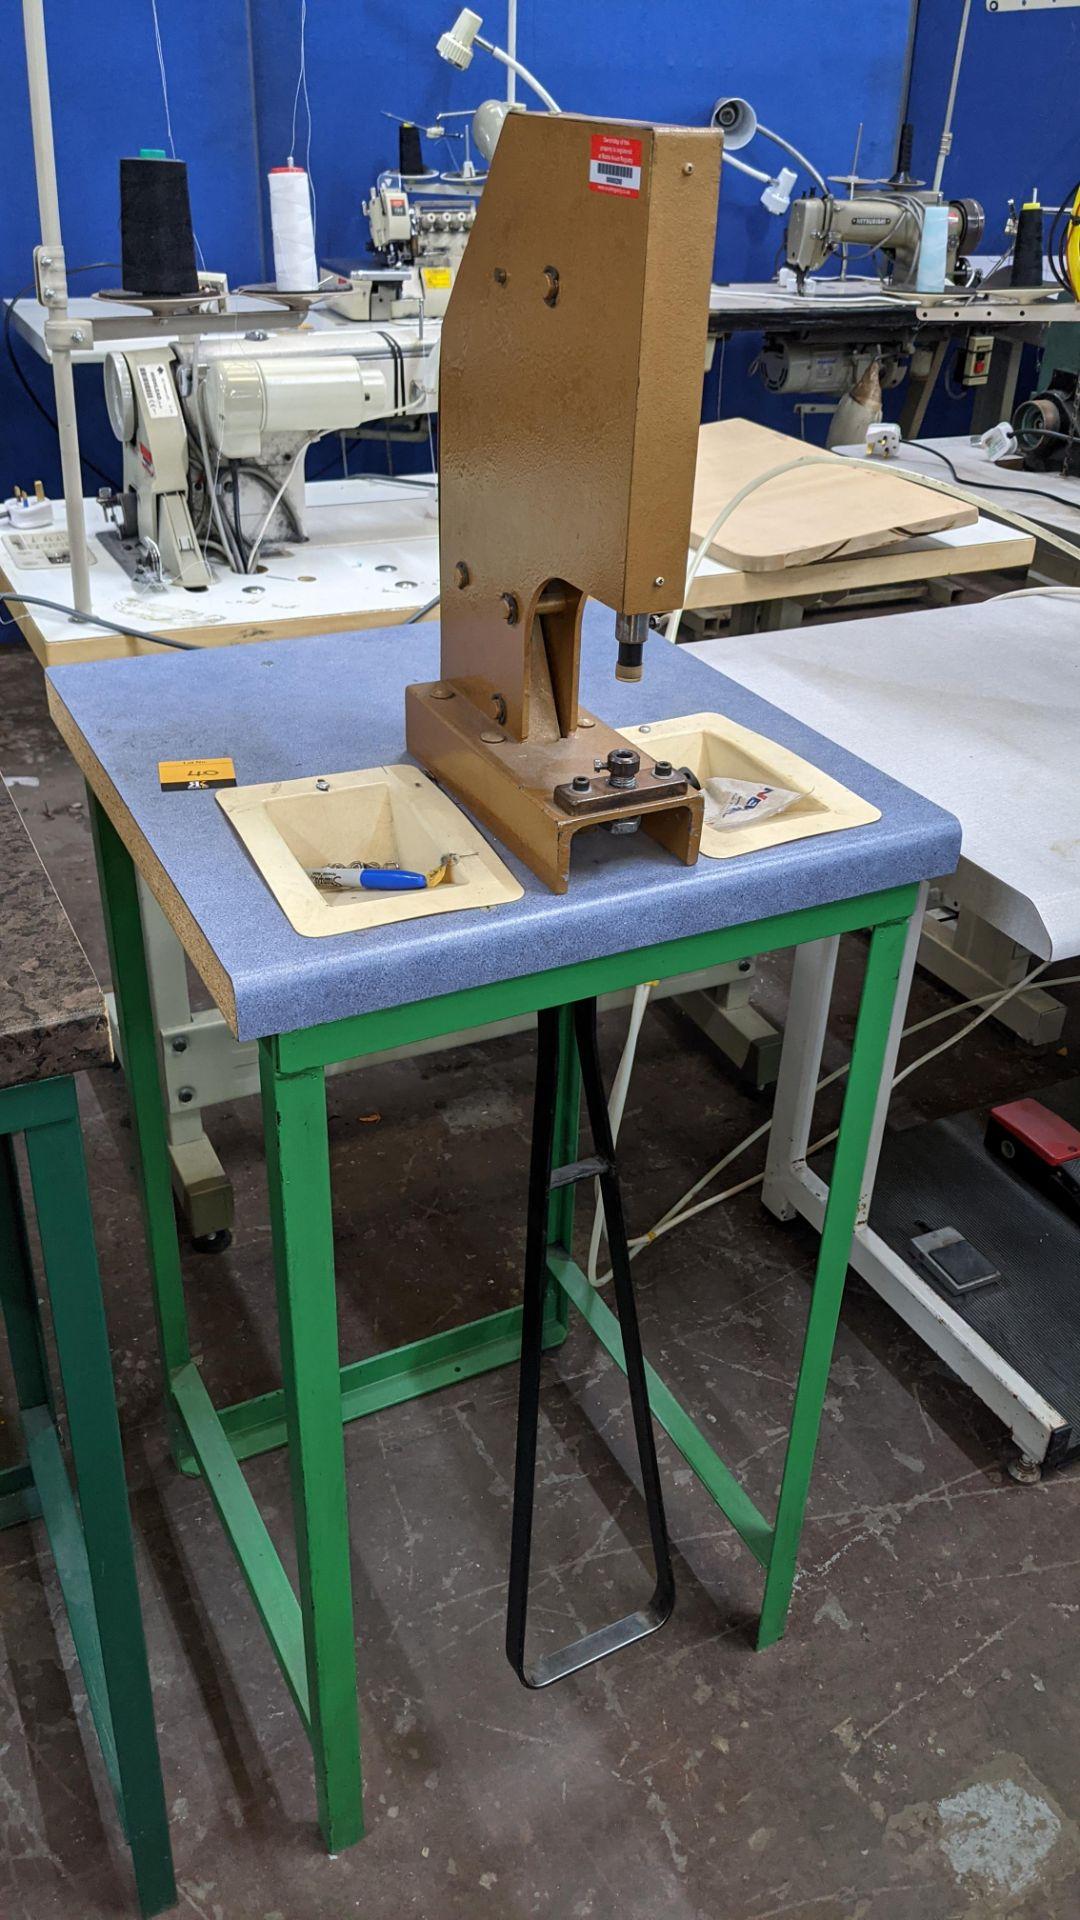 Foot operated riveting machine/press stud machine - Image 8 of 8